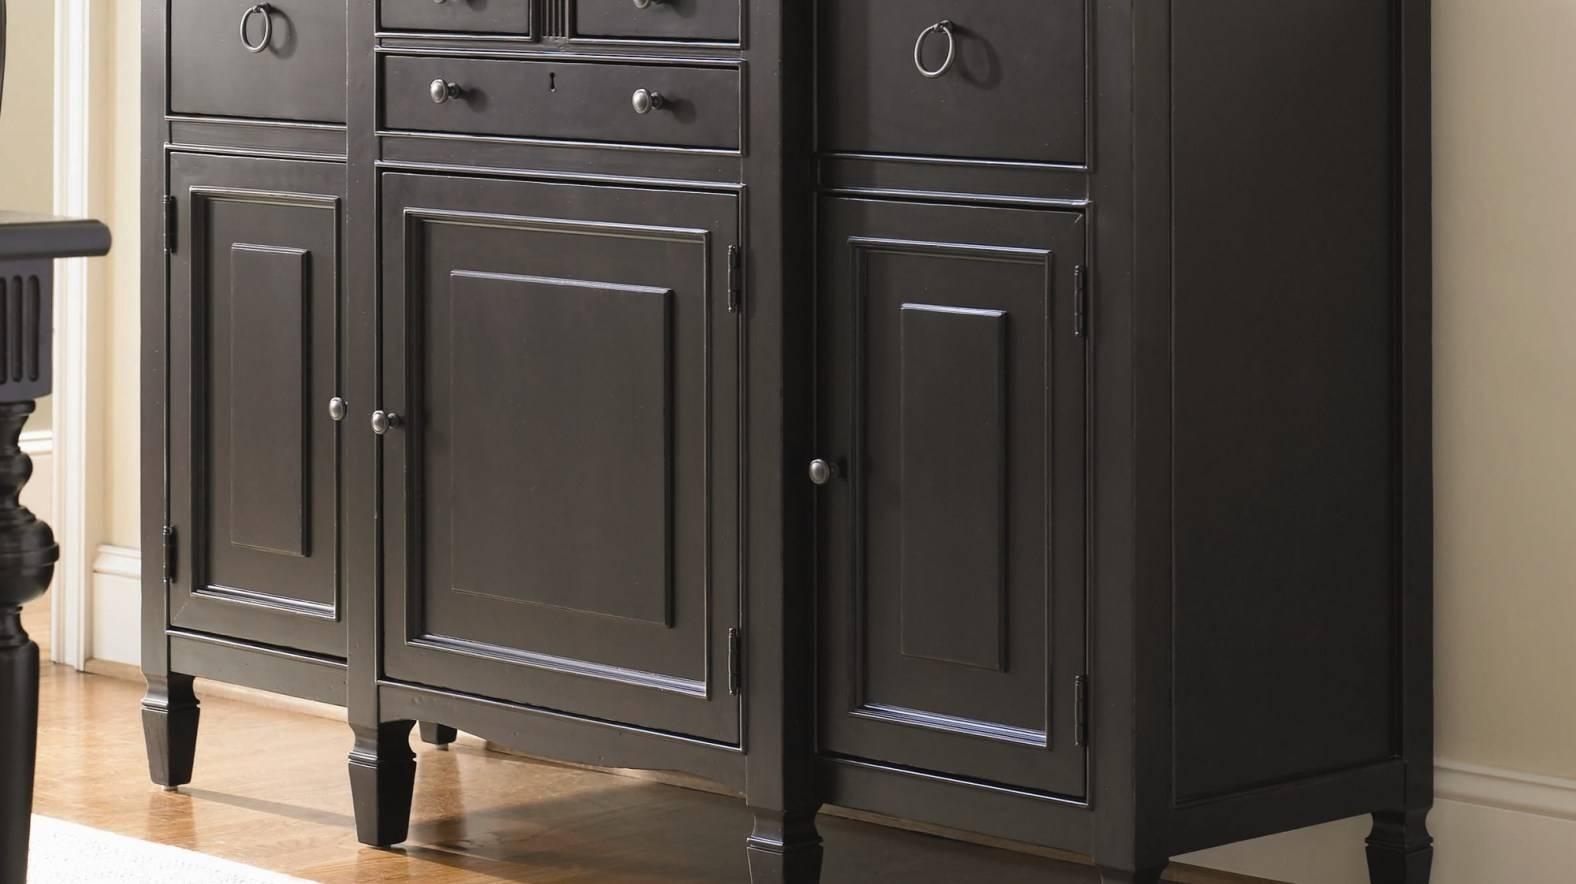 Sideboard : Sideboard Cabinet Buffet Miraculous Buffet Server in Buffet Servers and Sideboards (Image 10 of 15)